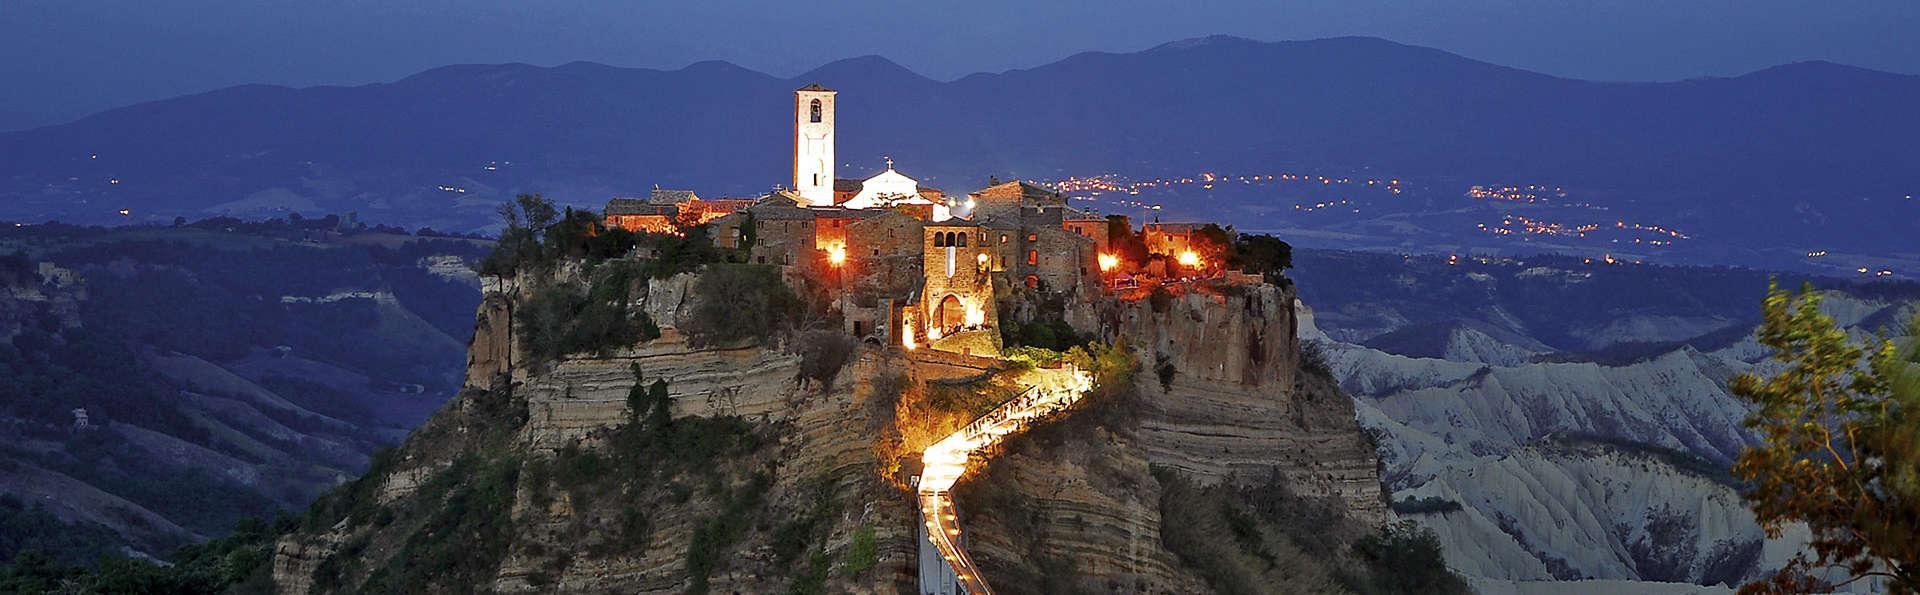 Terme Salus Hotel (Adults Only) - EDIT_destination1.jpg